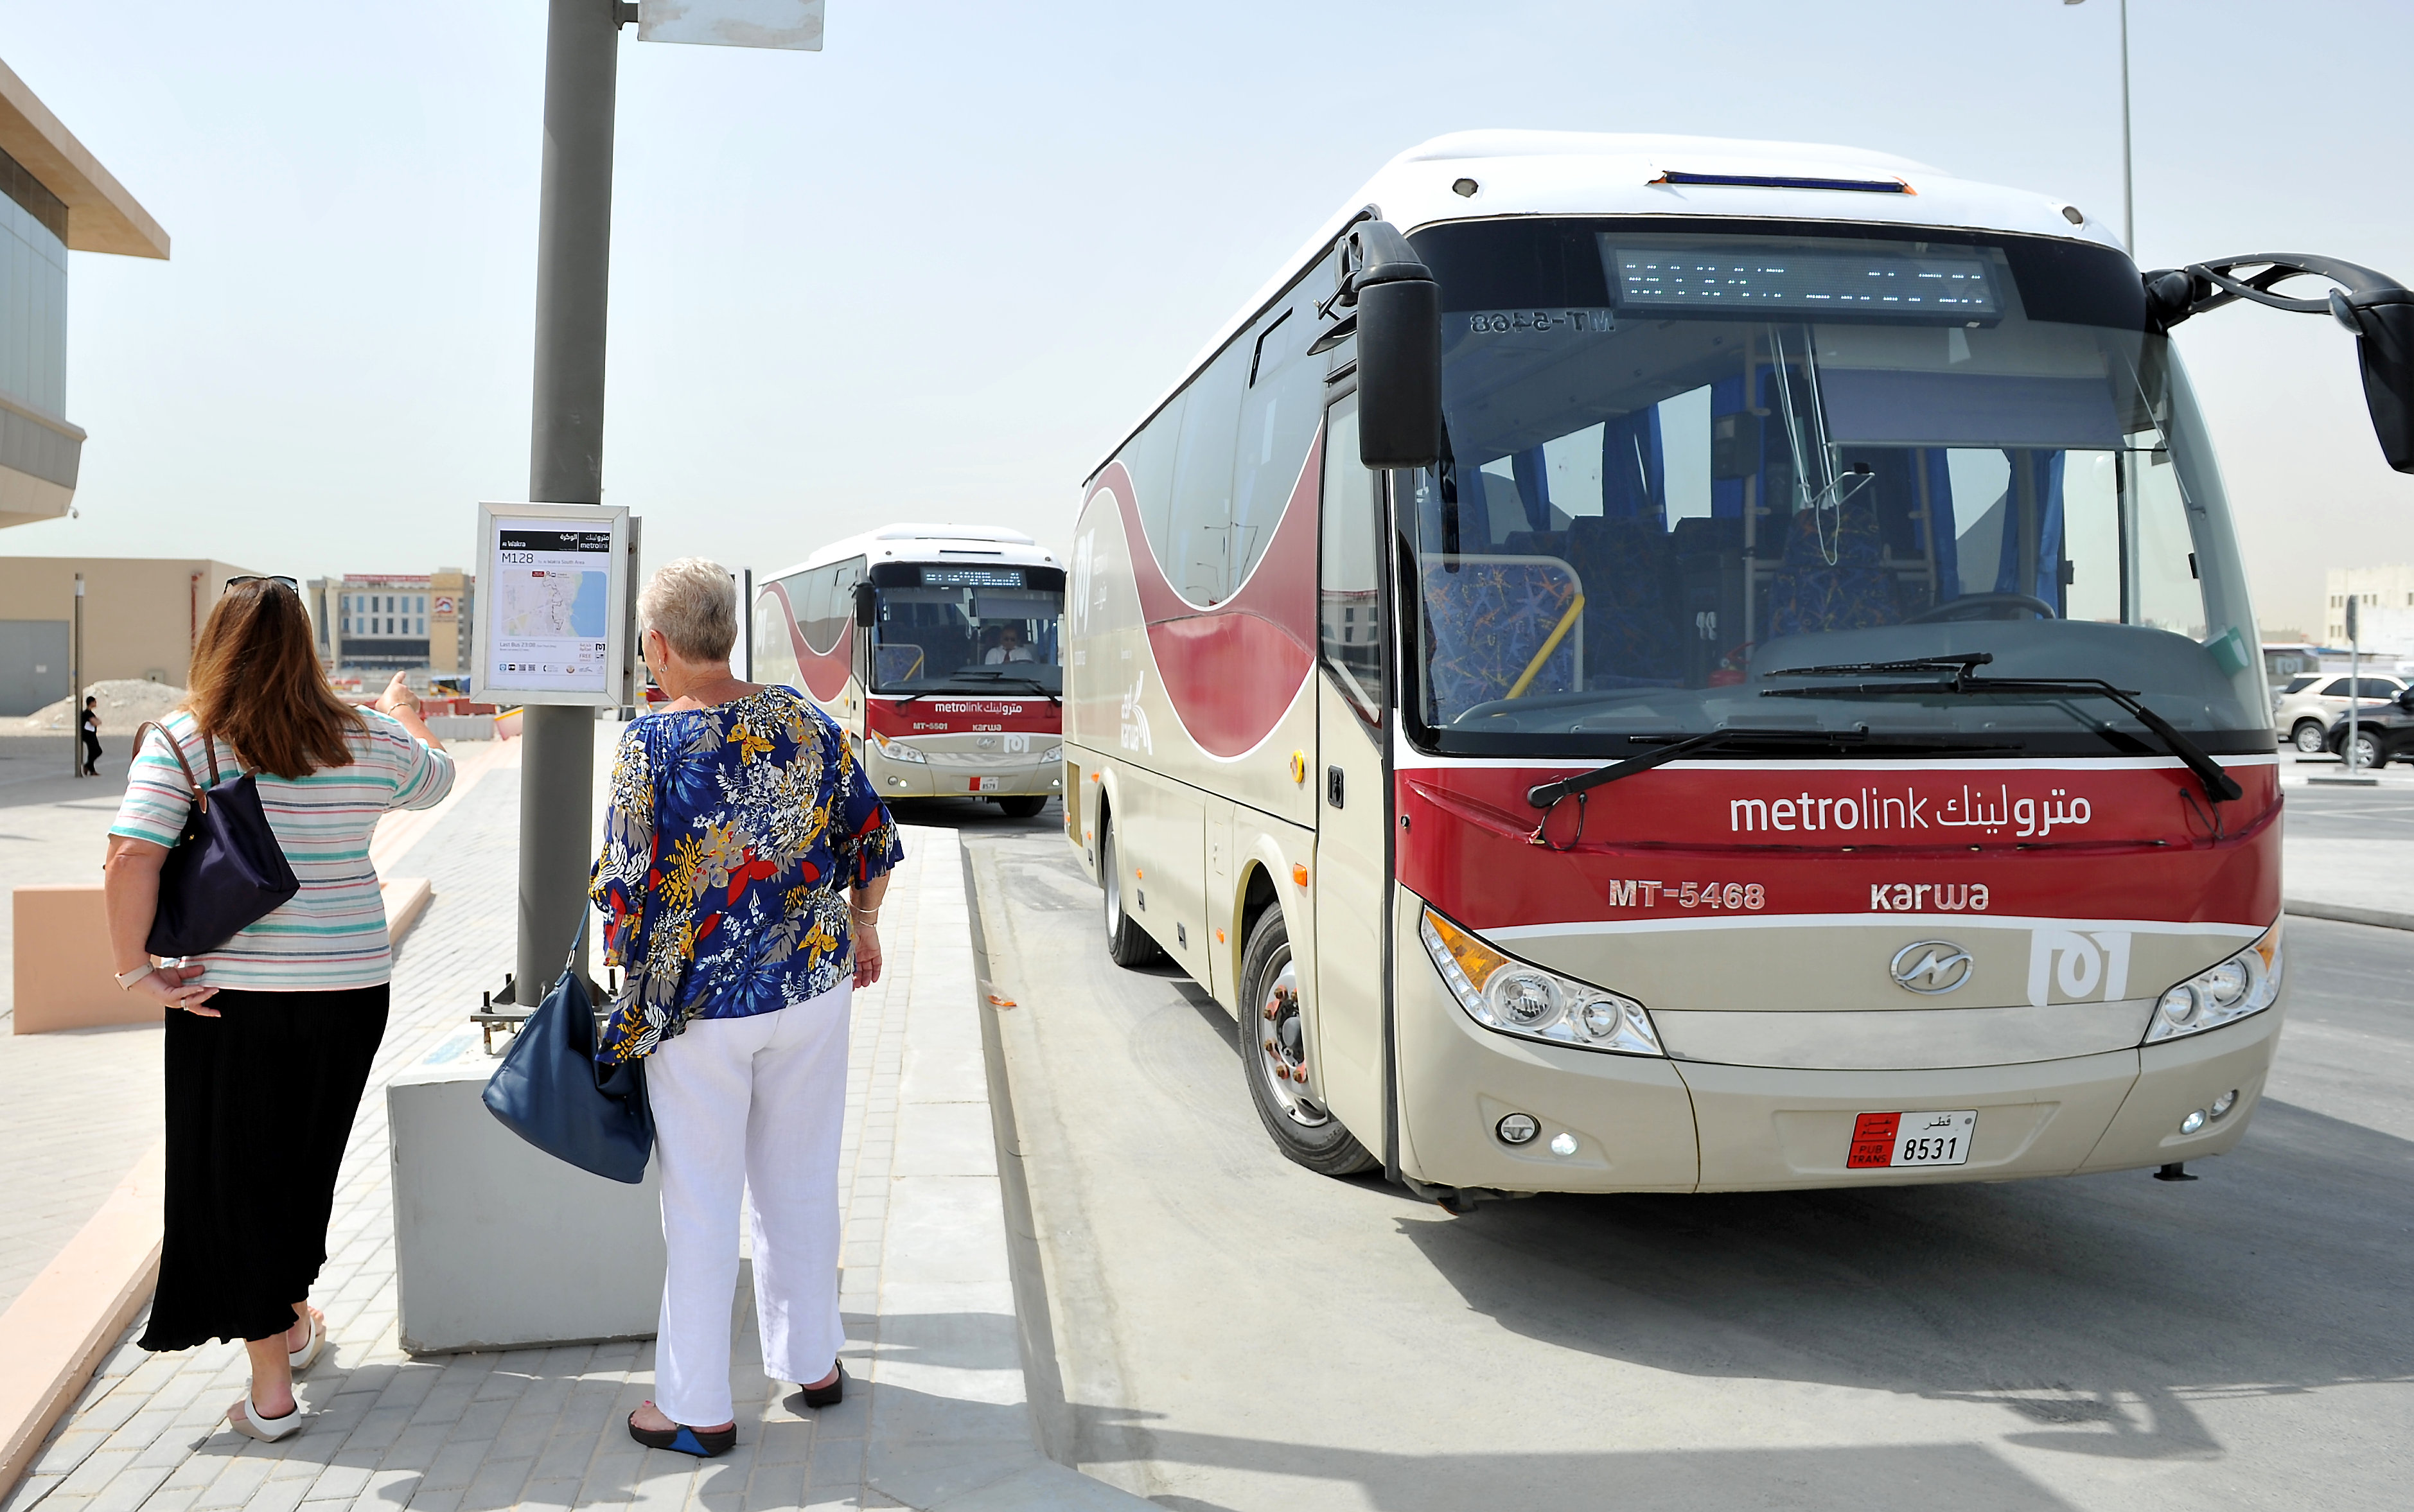 Doha Metro travellers praise feeder bus services